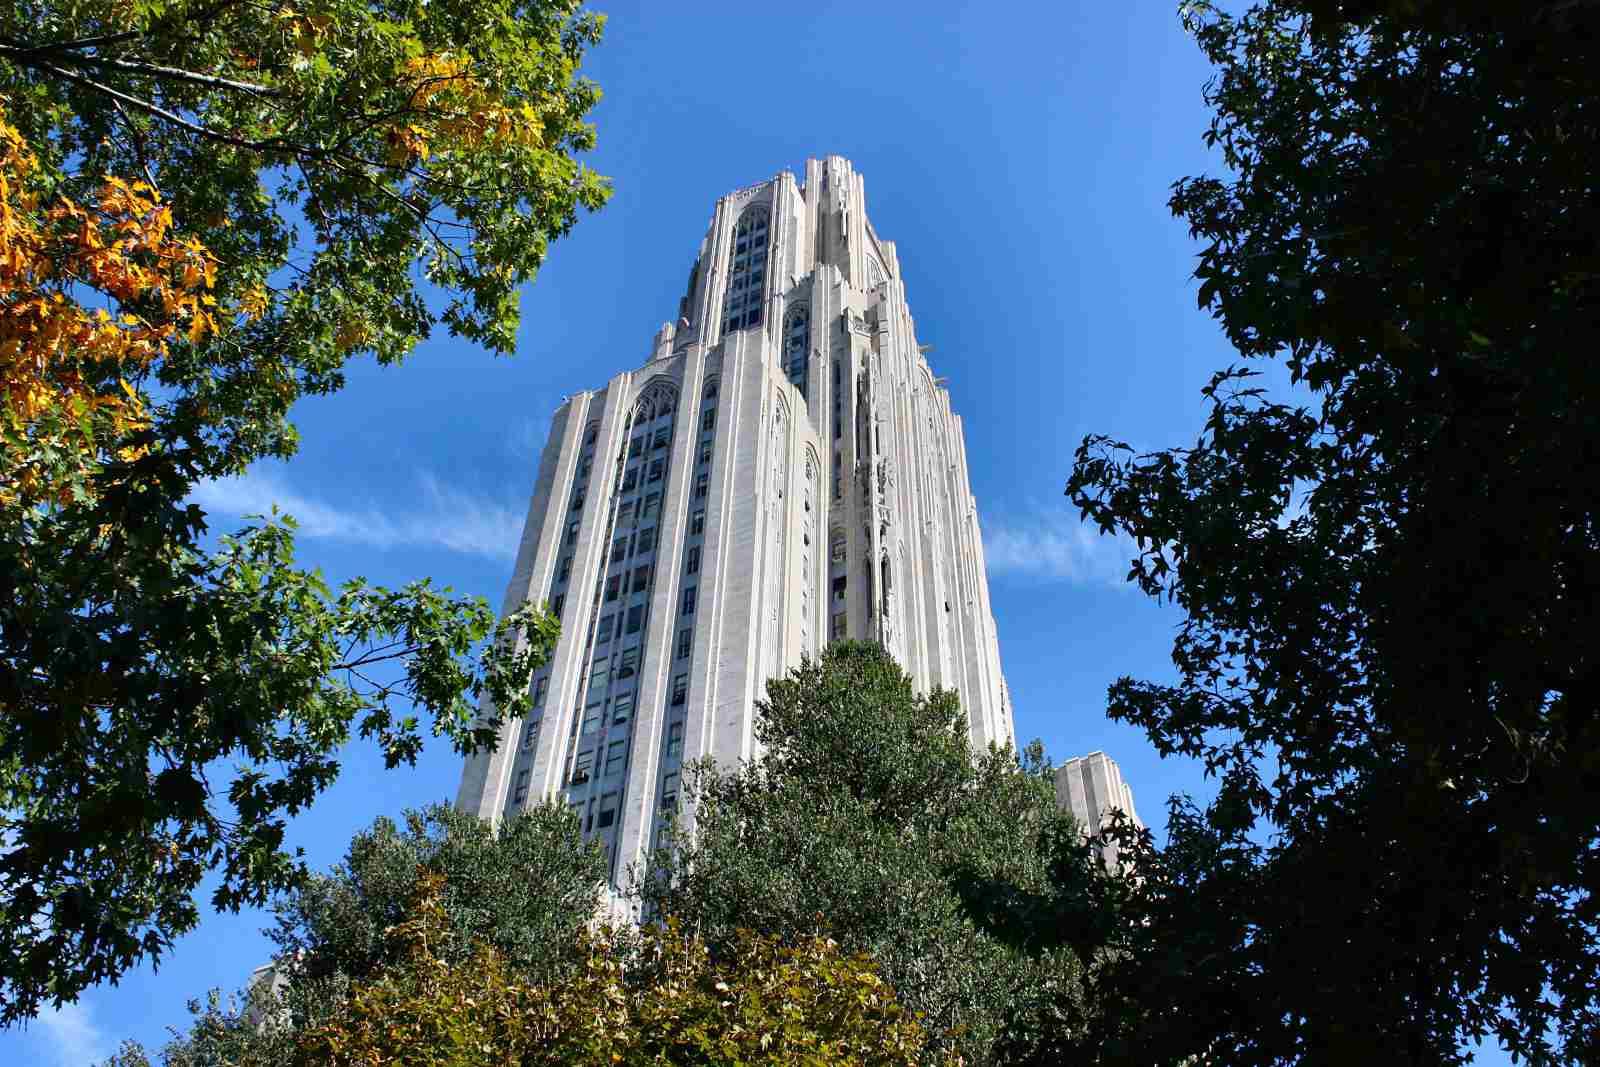 Catedral del Aprendizaje de la Universidad de Pittsburgh